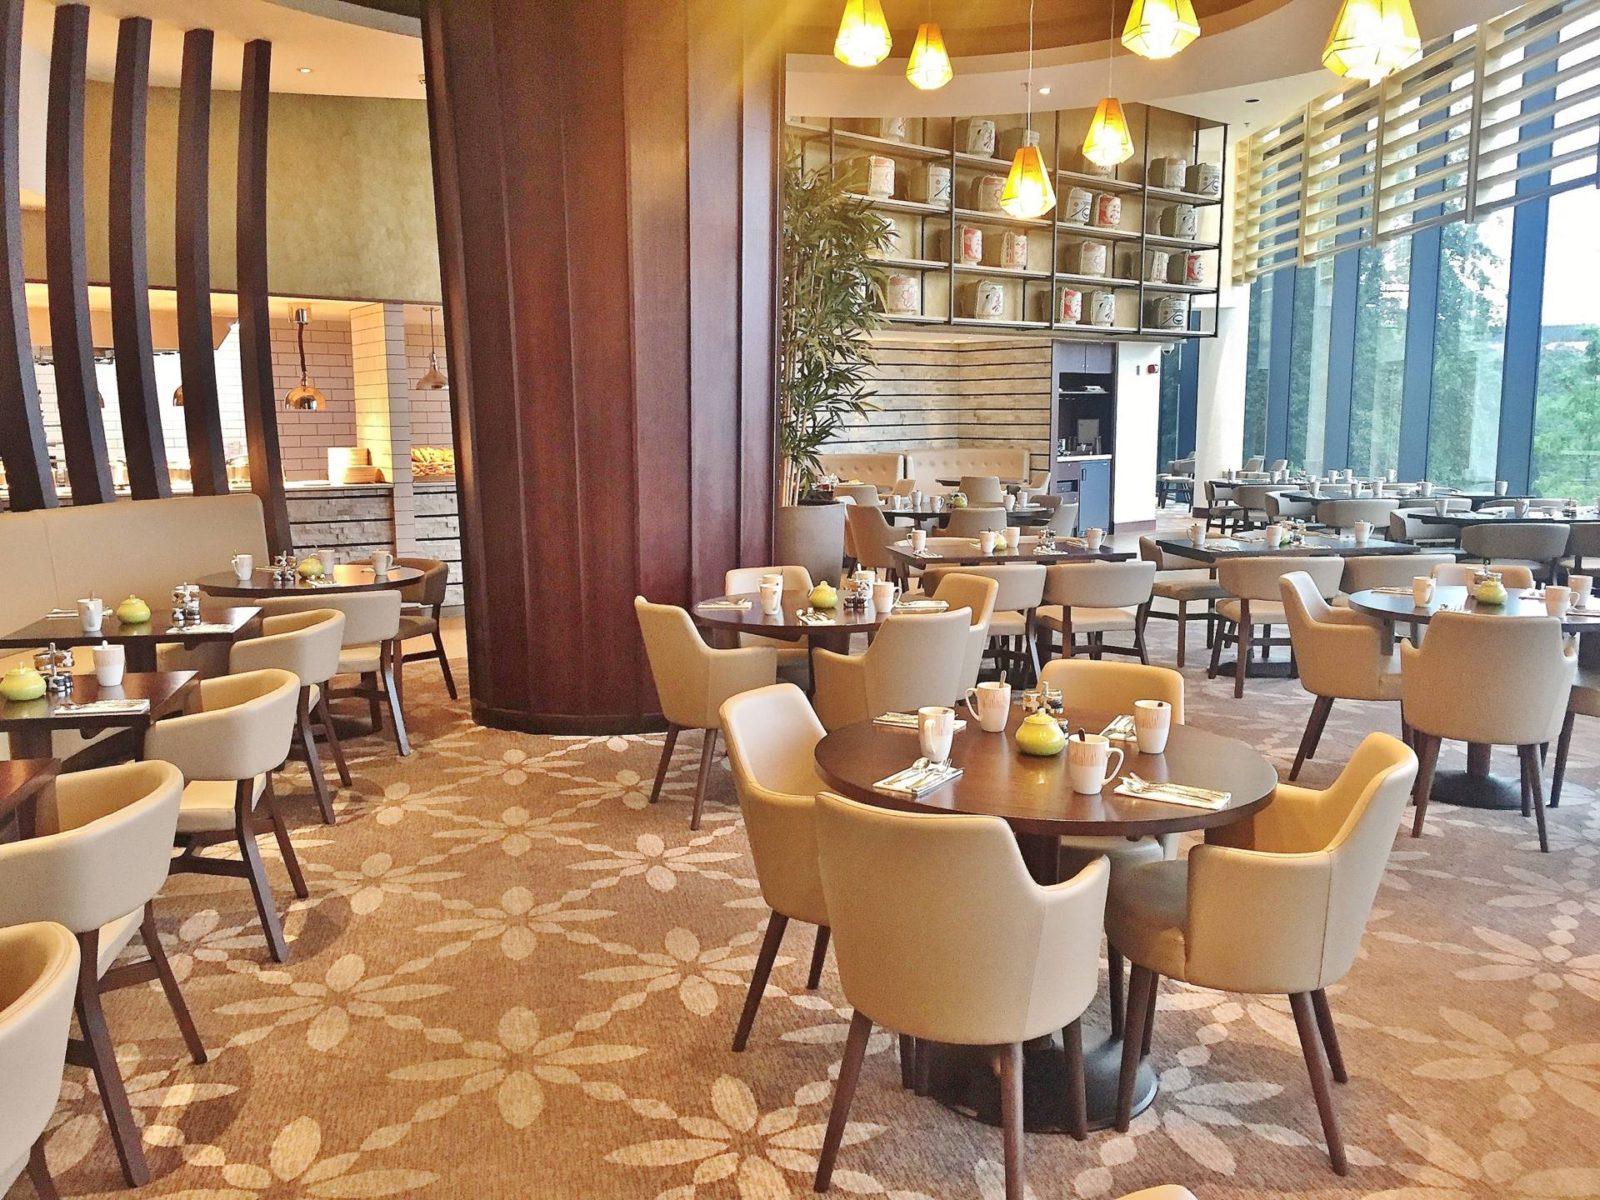 Genting Hotel Robata